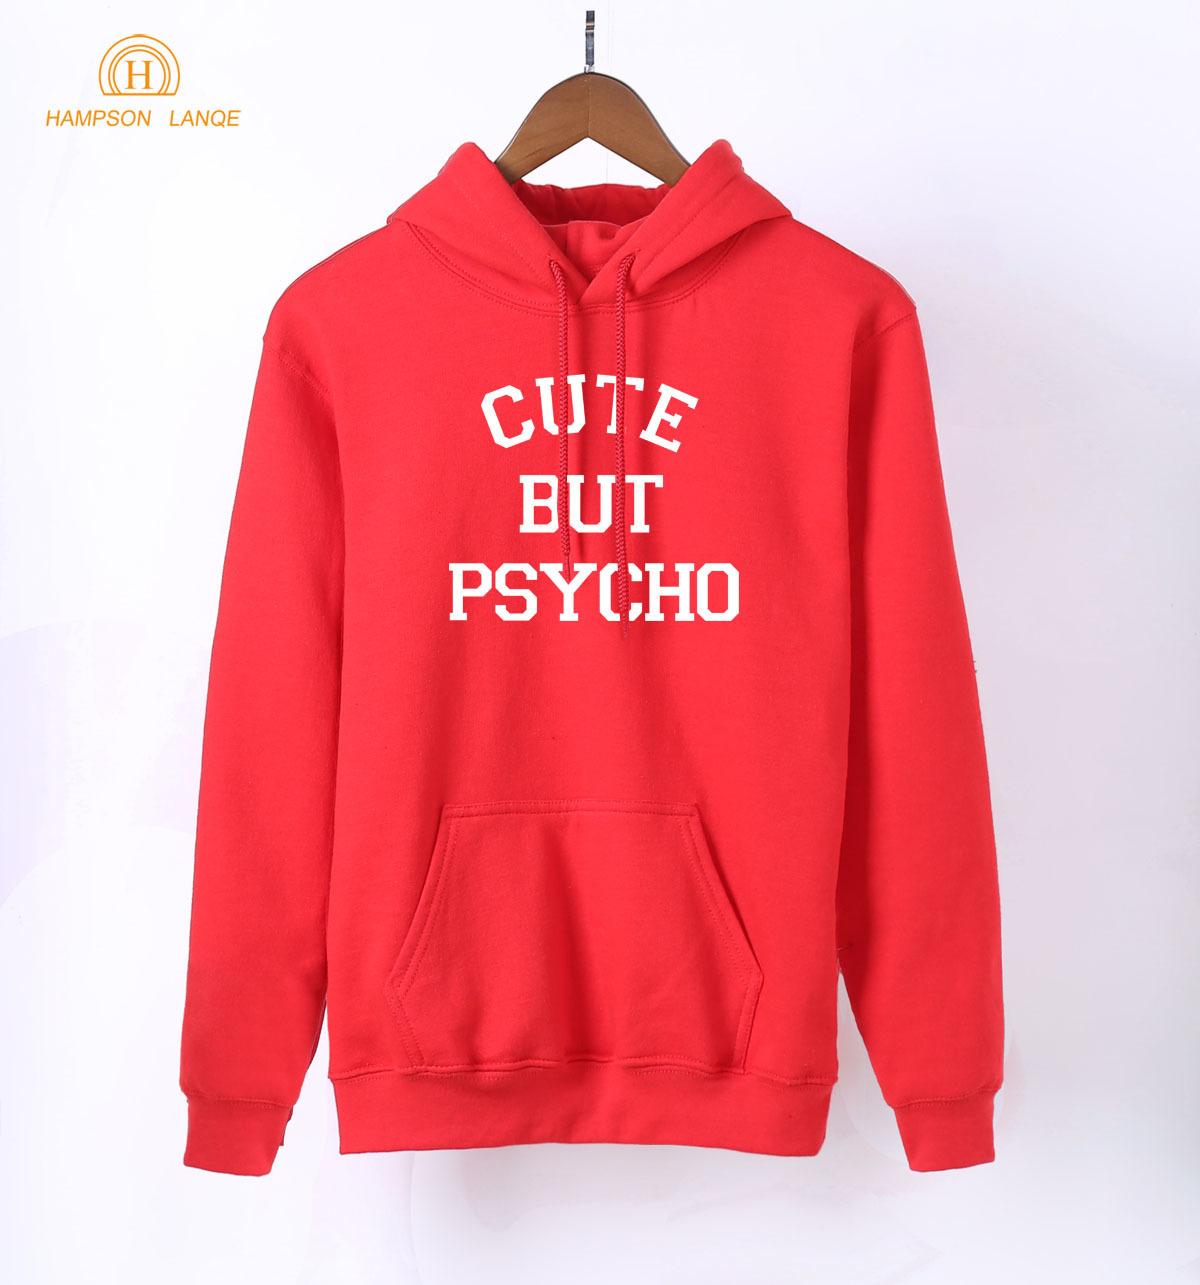 Funny Hoodies Women 2019 Hot Spring Autumn Kawaii Sweatshirts Women Kpop Pink Warm Fleece Harajuku Brand Hoodie